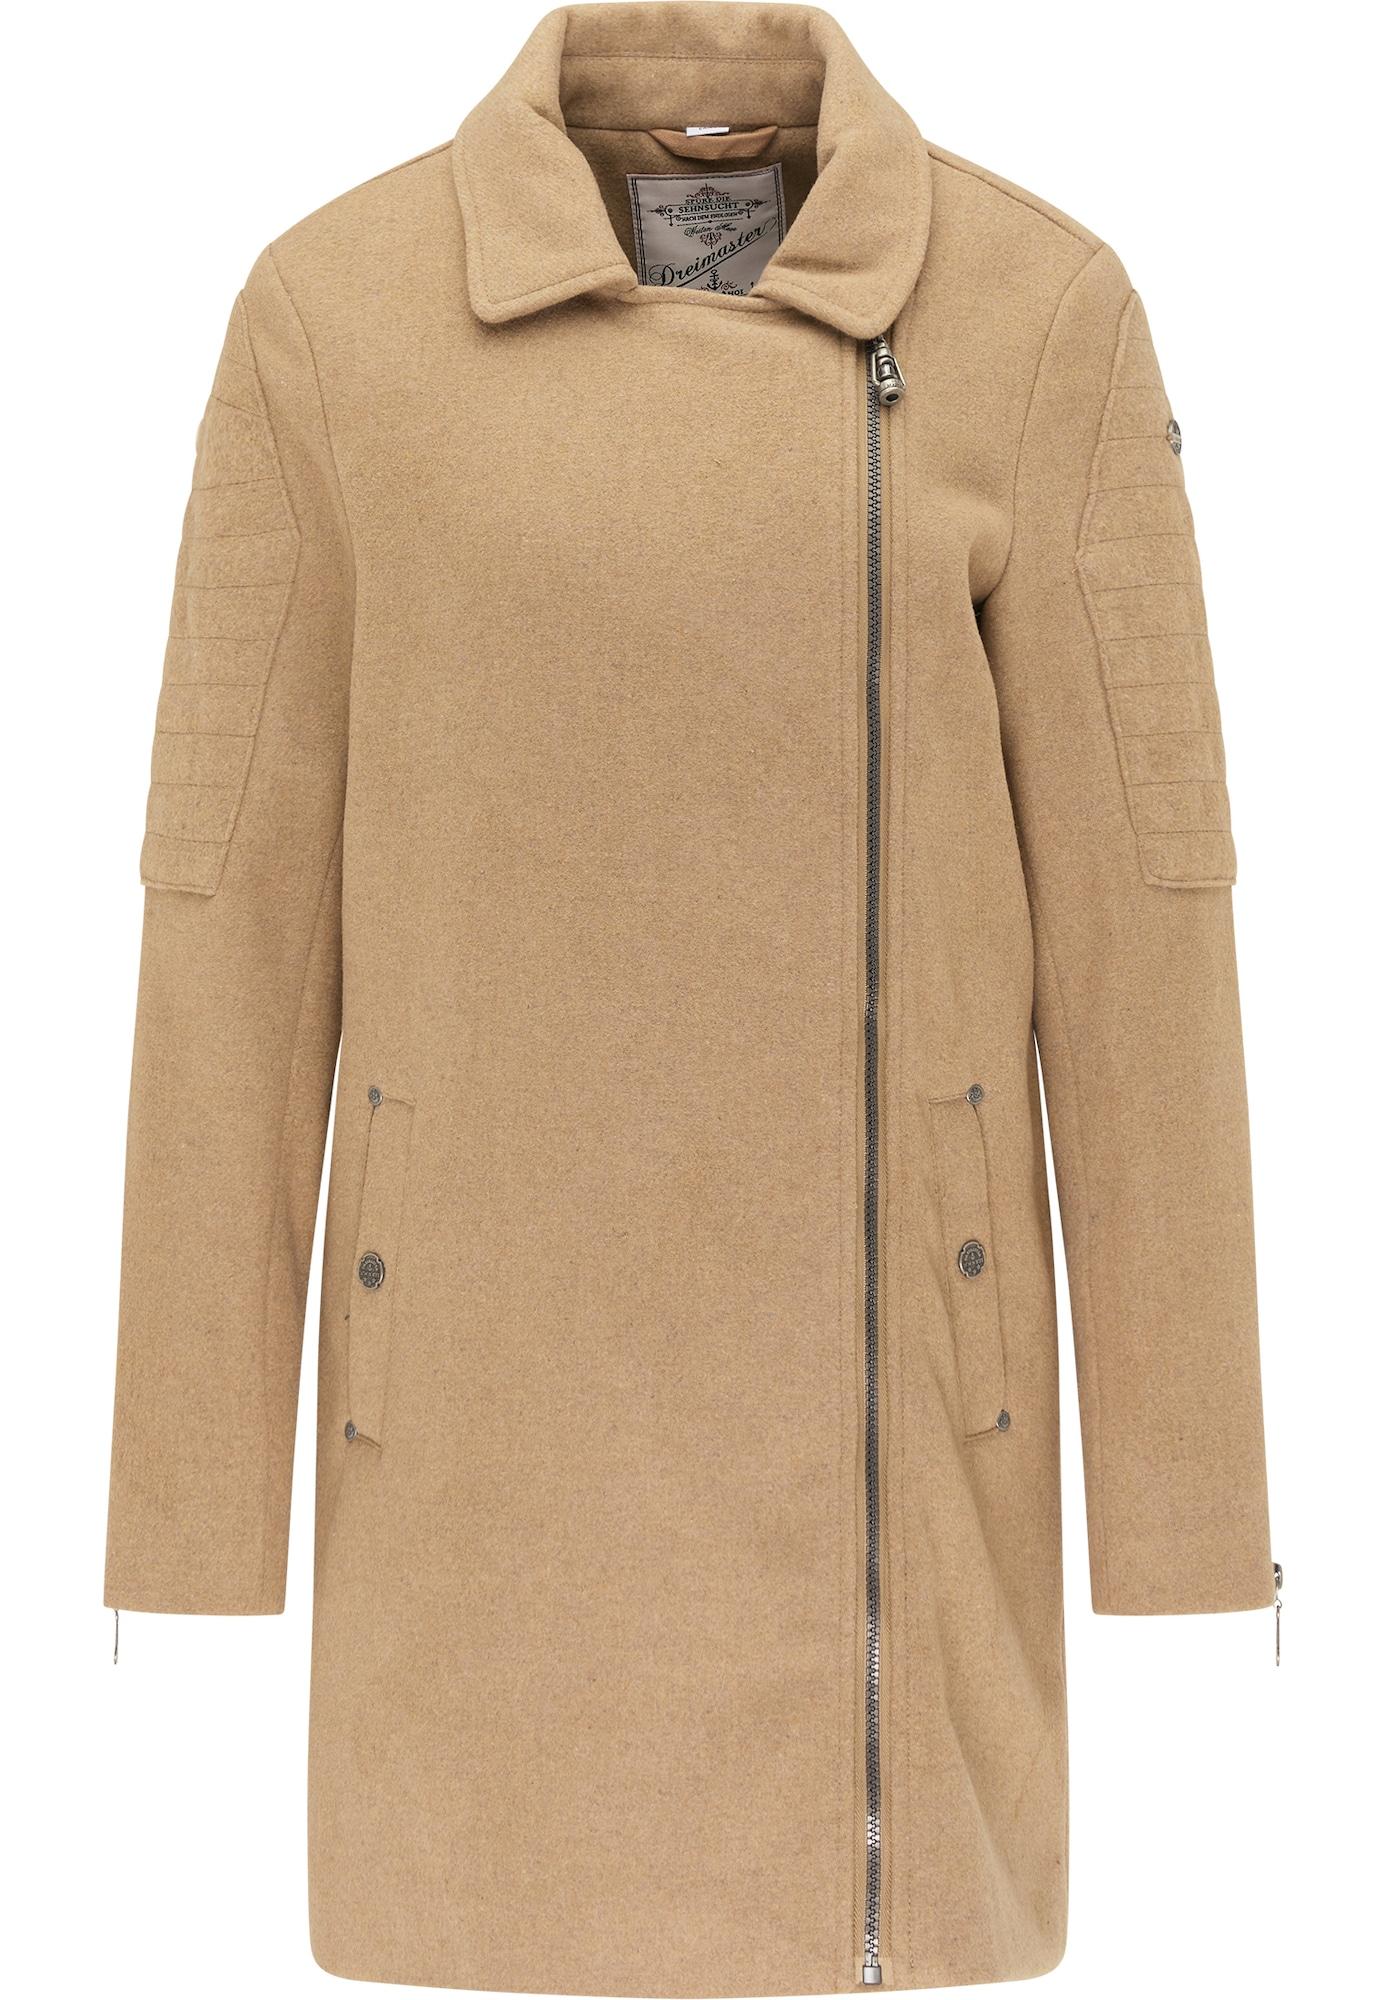 DreiMaster Vintage Demisezoninis paltas smėlio